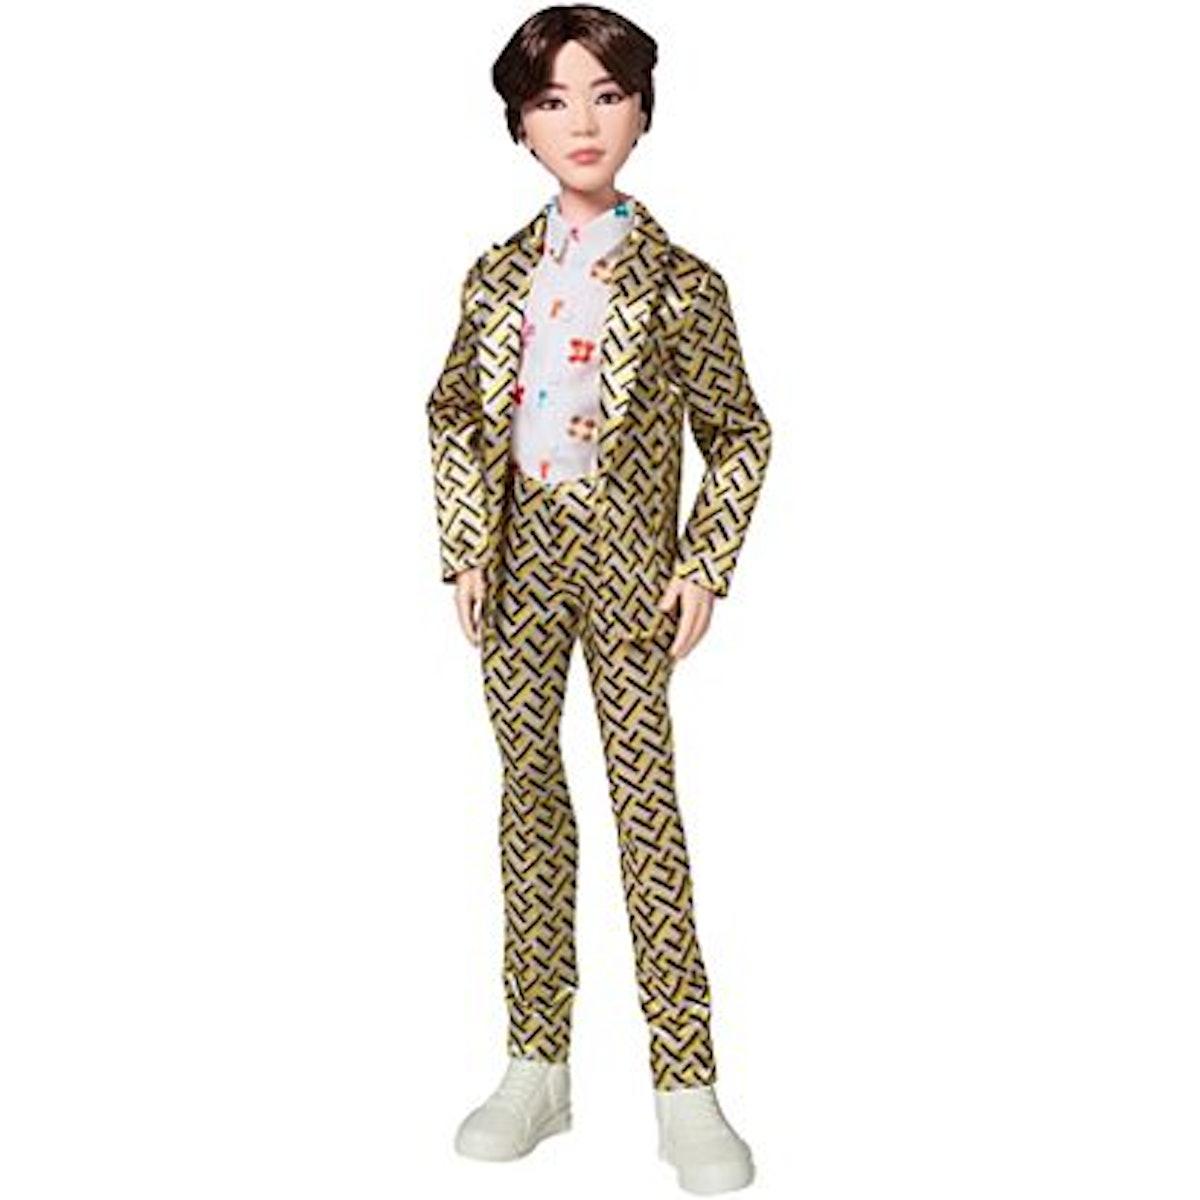 Mattel - BTS Suga Idol Fashion Doll